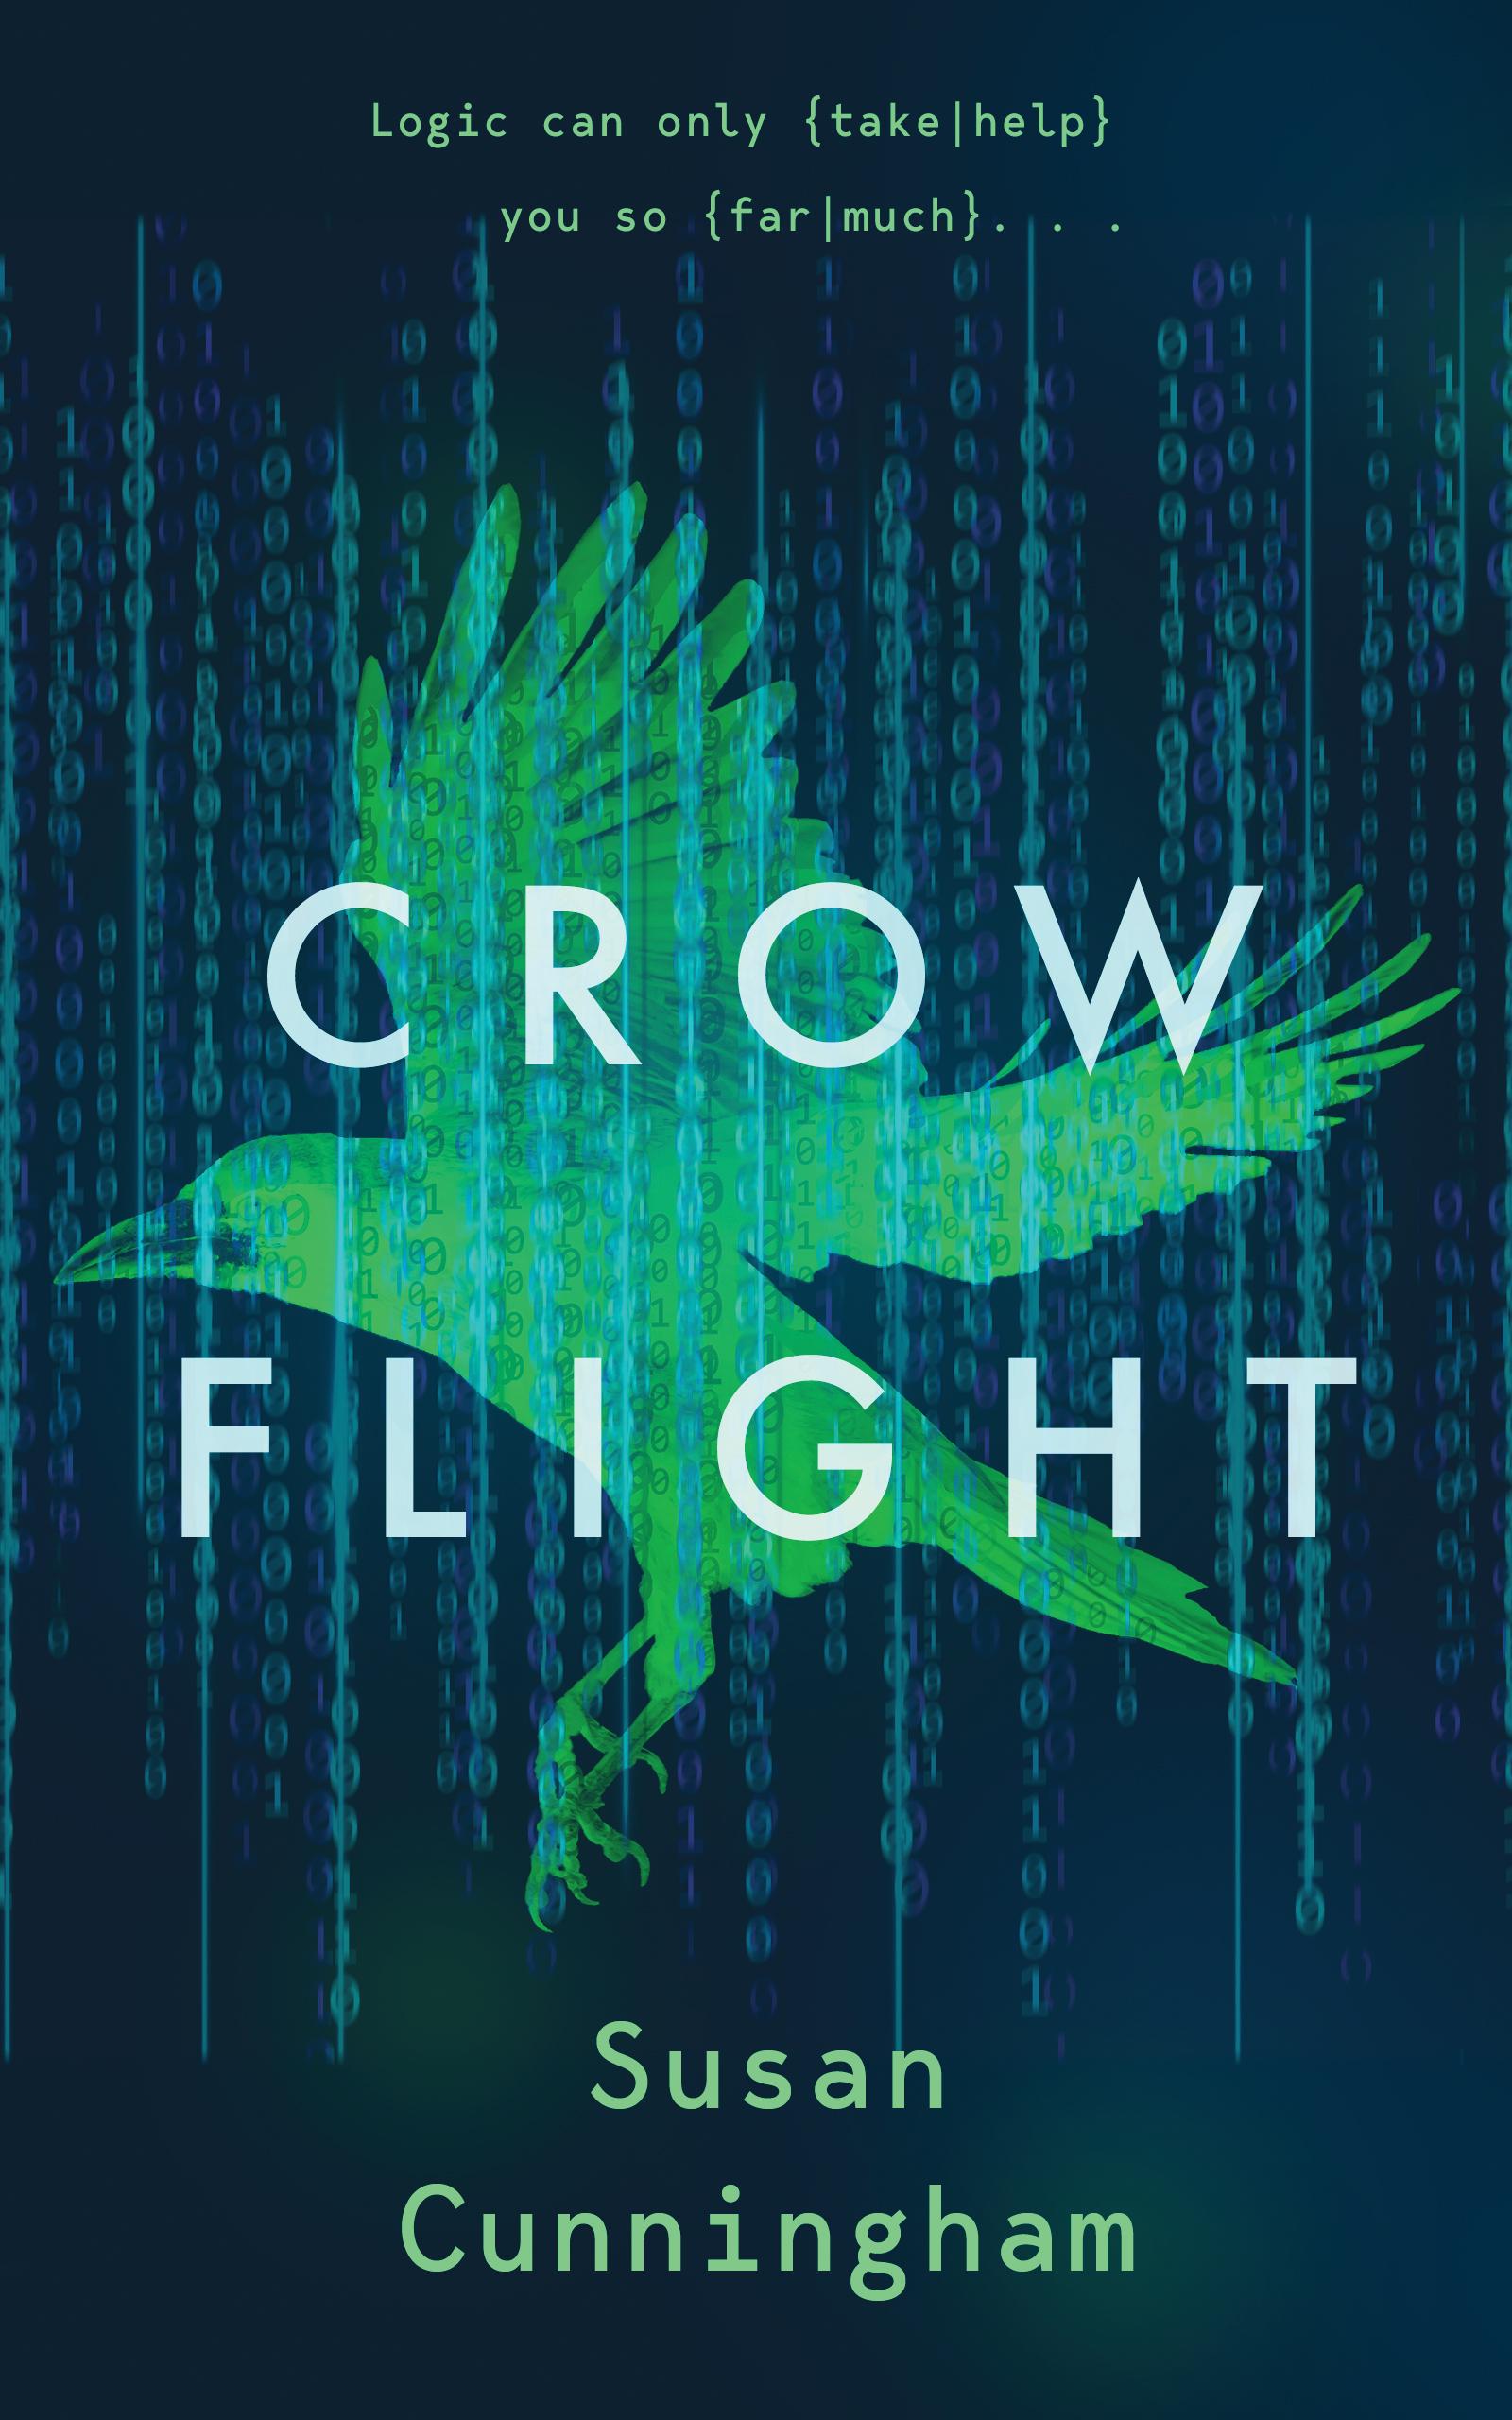 Cunningham Susan Crow Flight cover 20180831.jpg